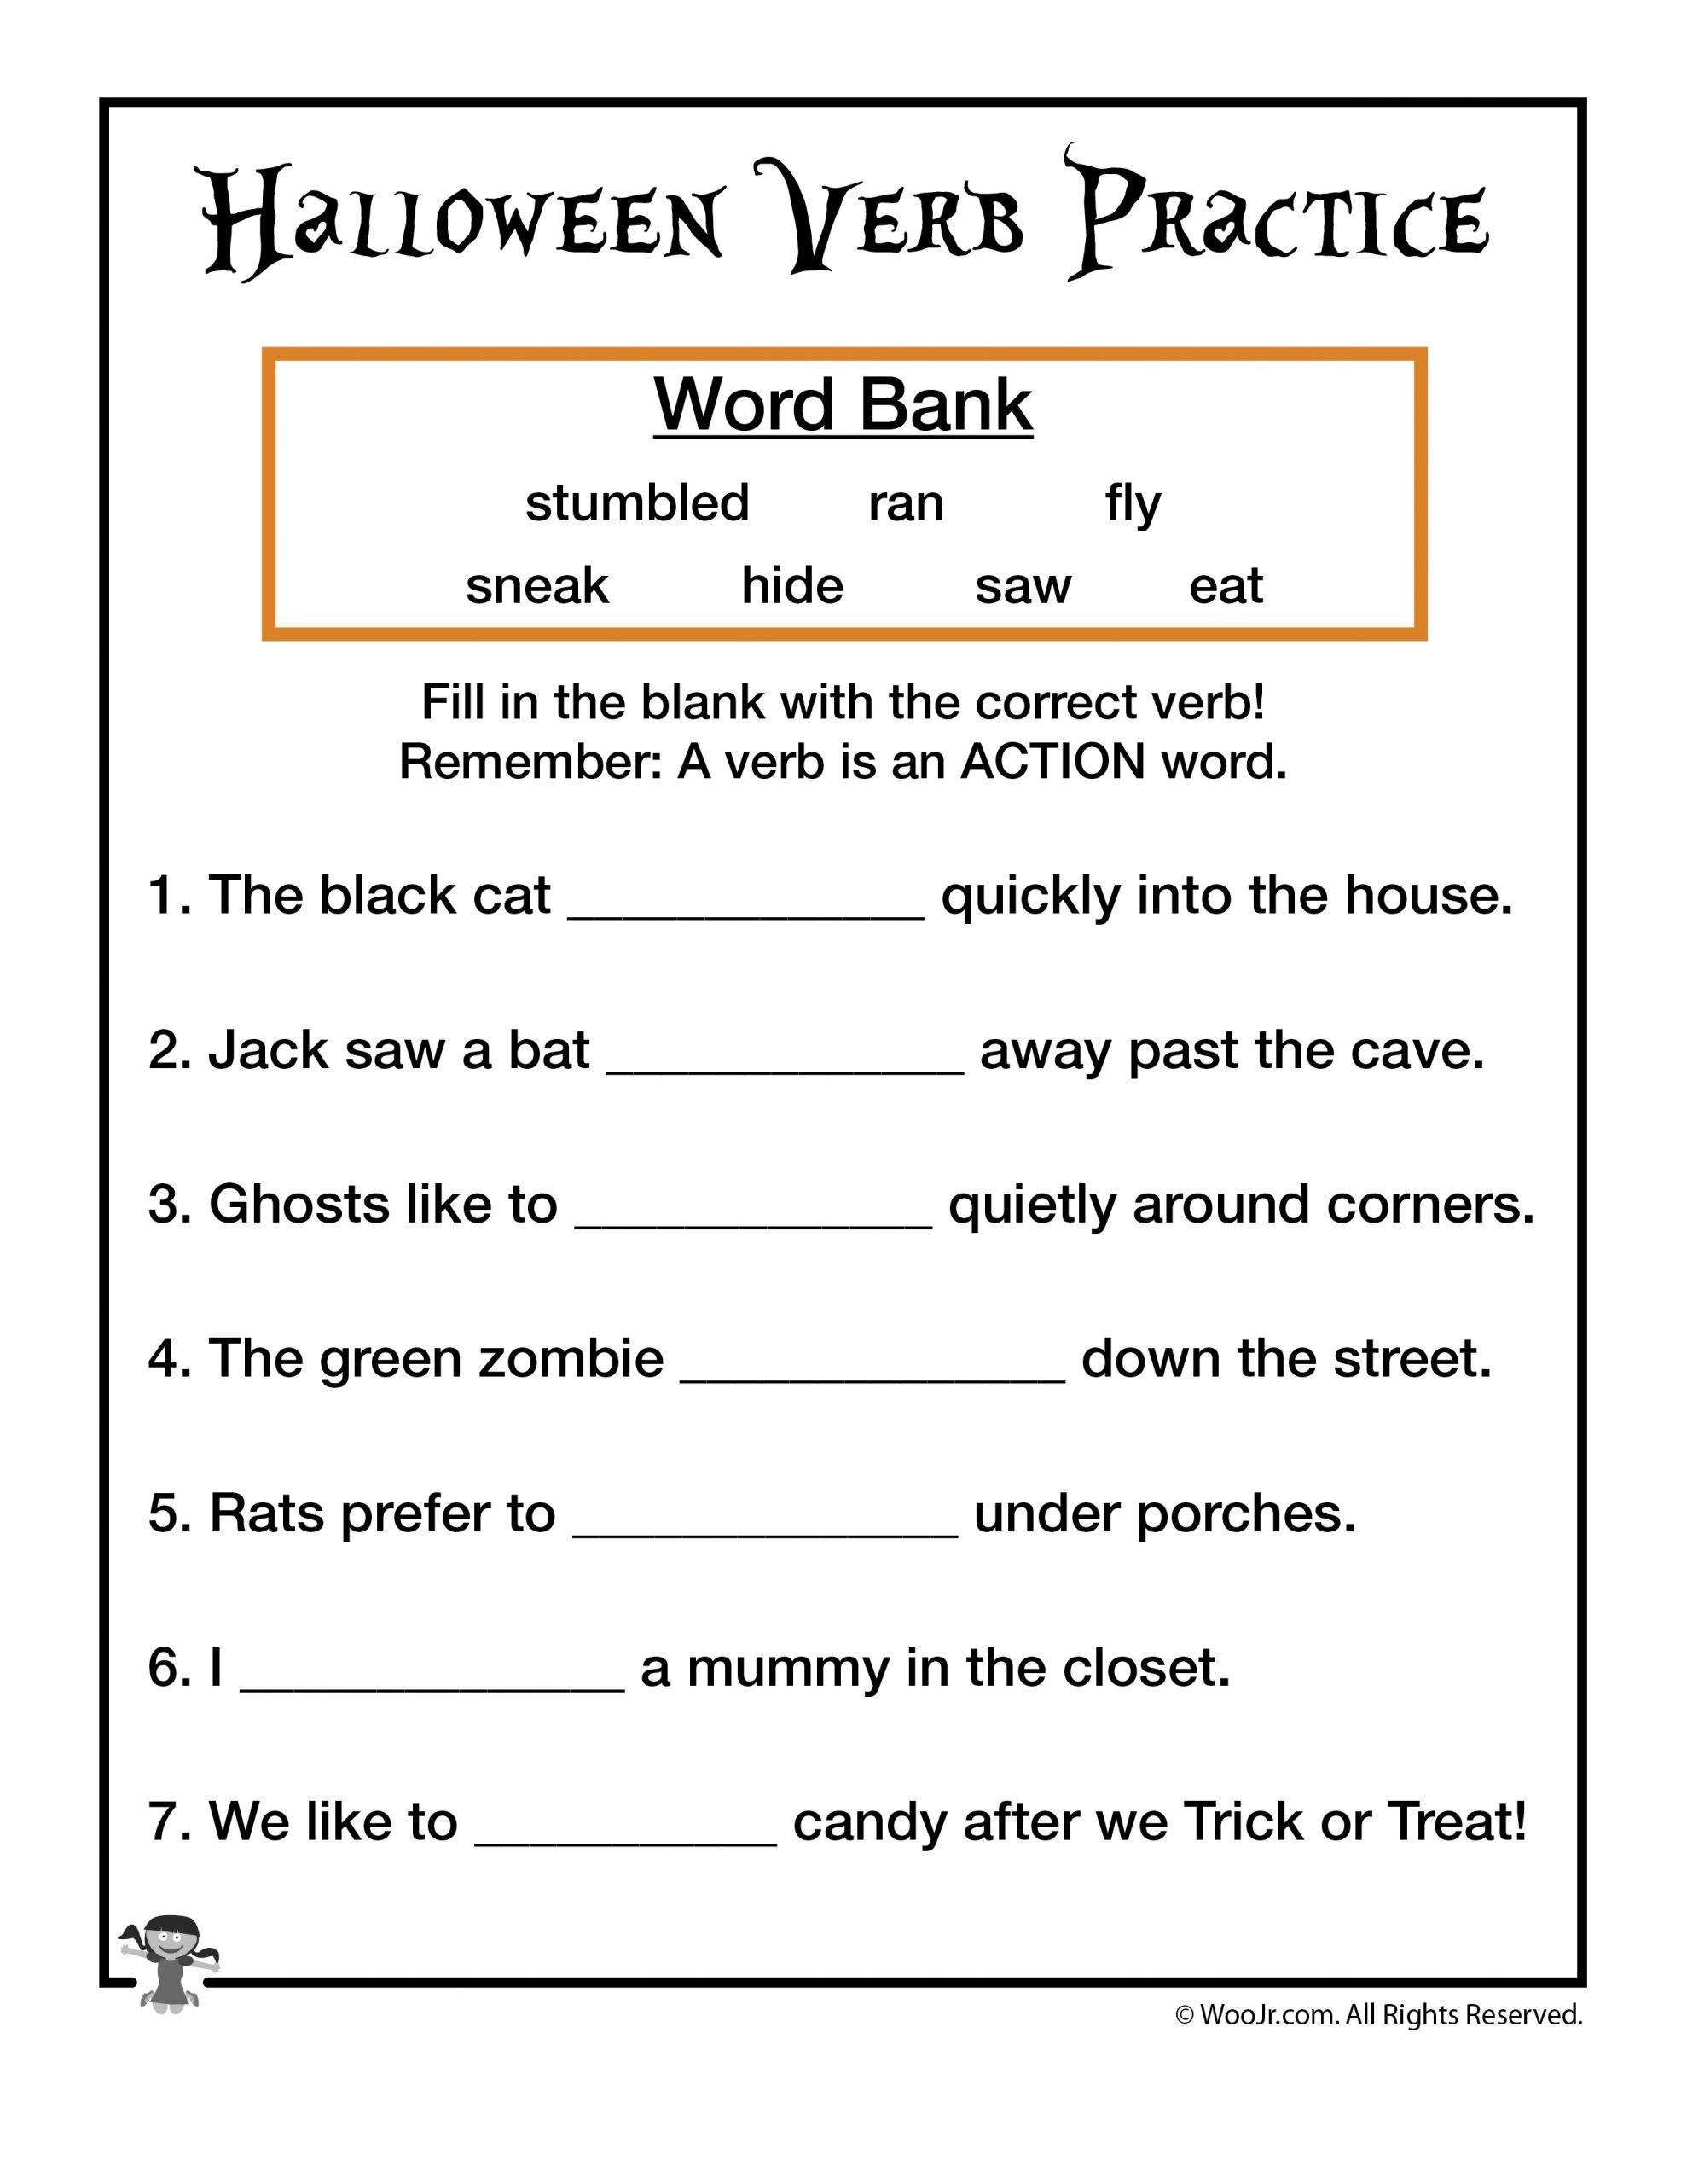 47 Verb Worksheet Activities Image Ideas – Lbwomen